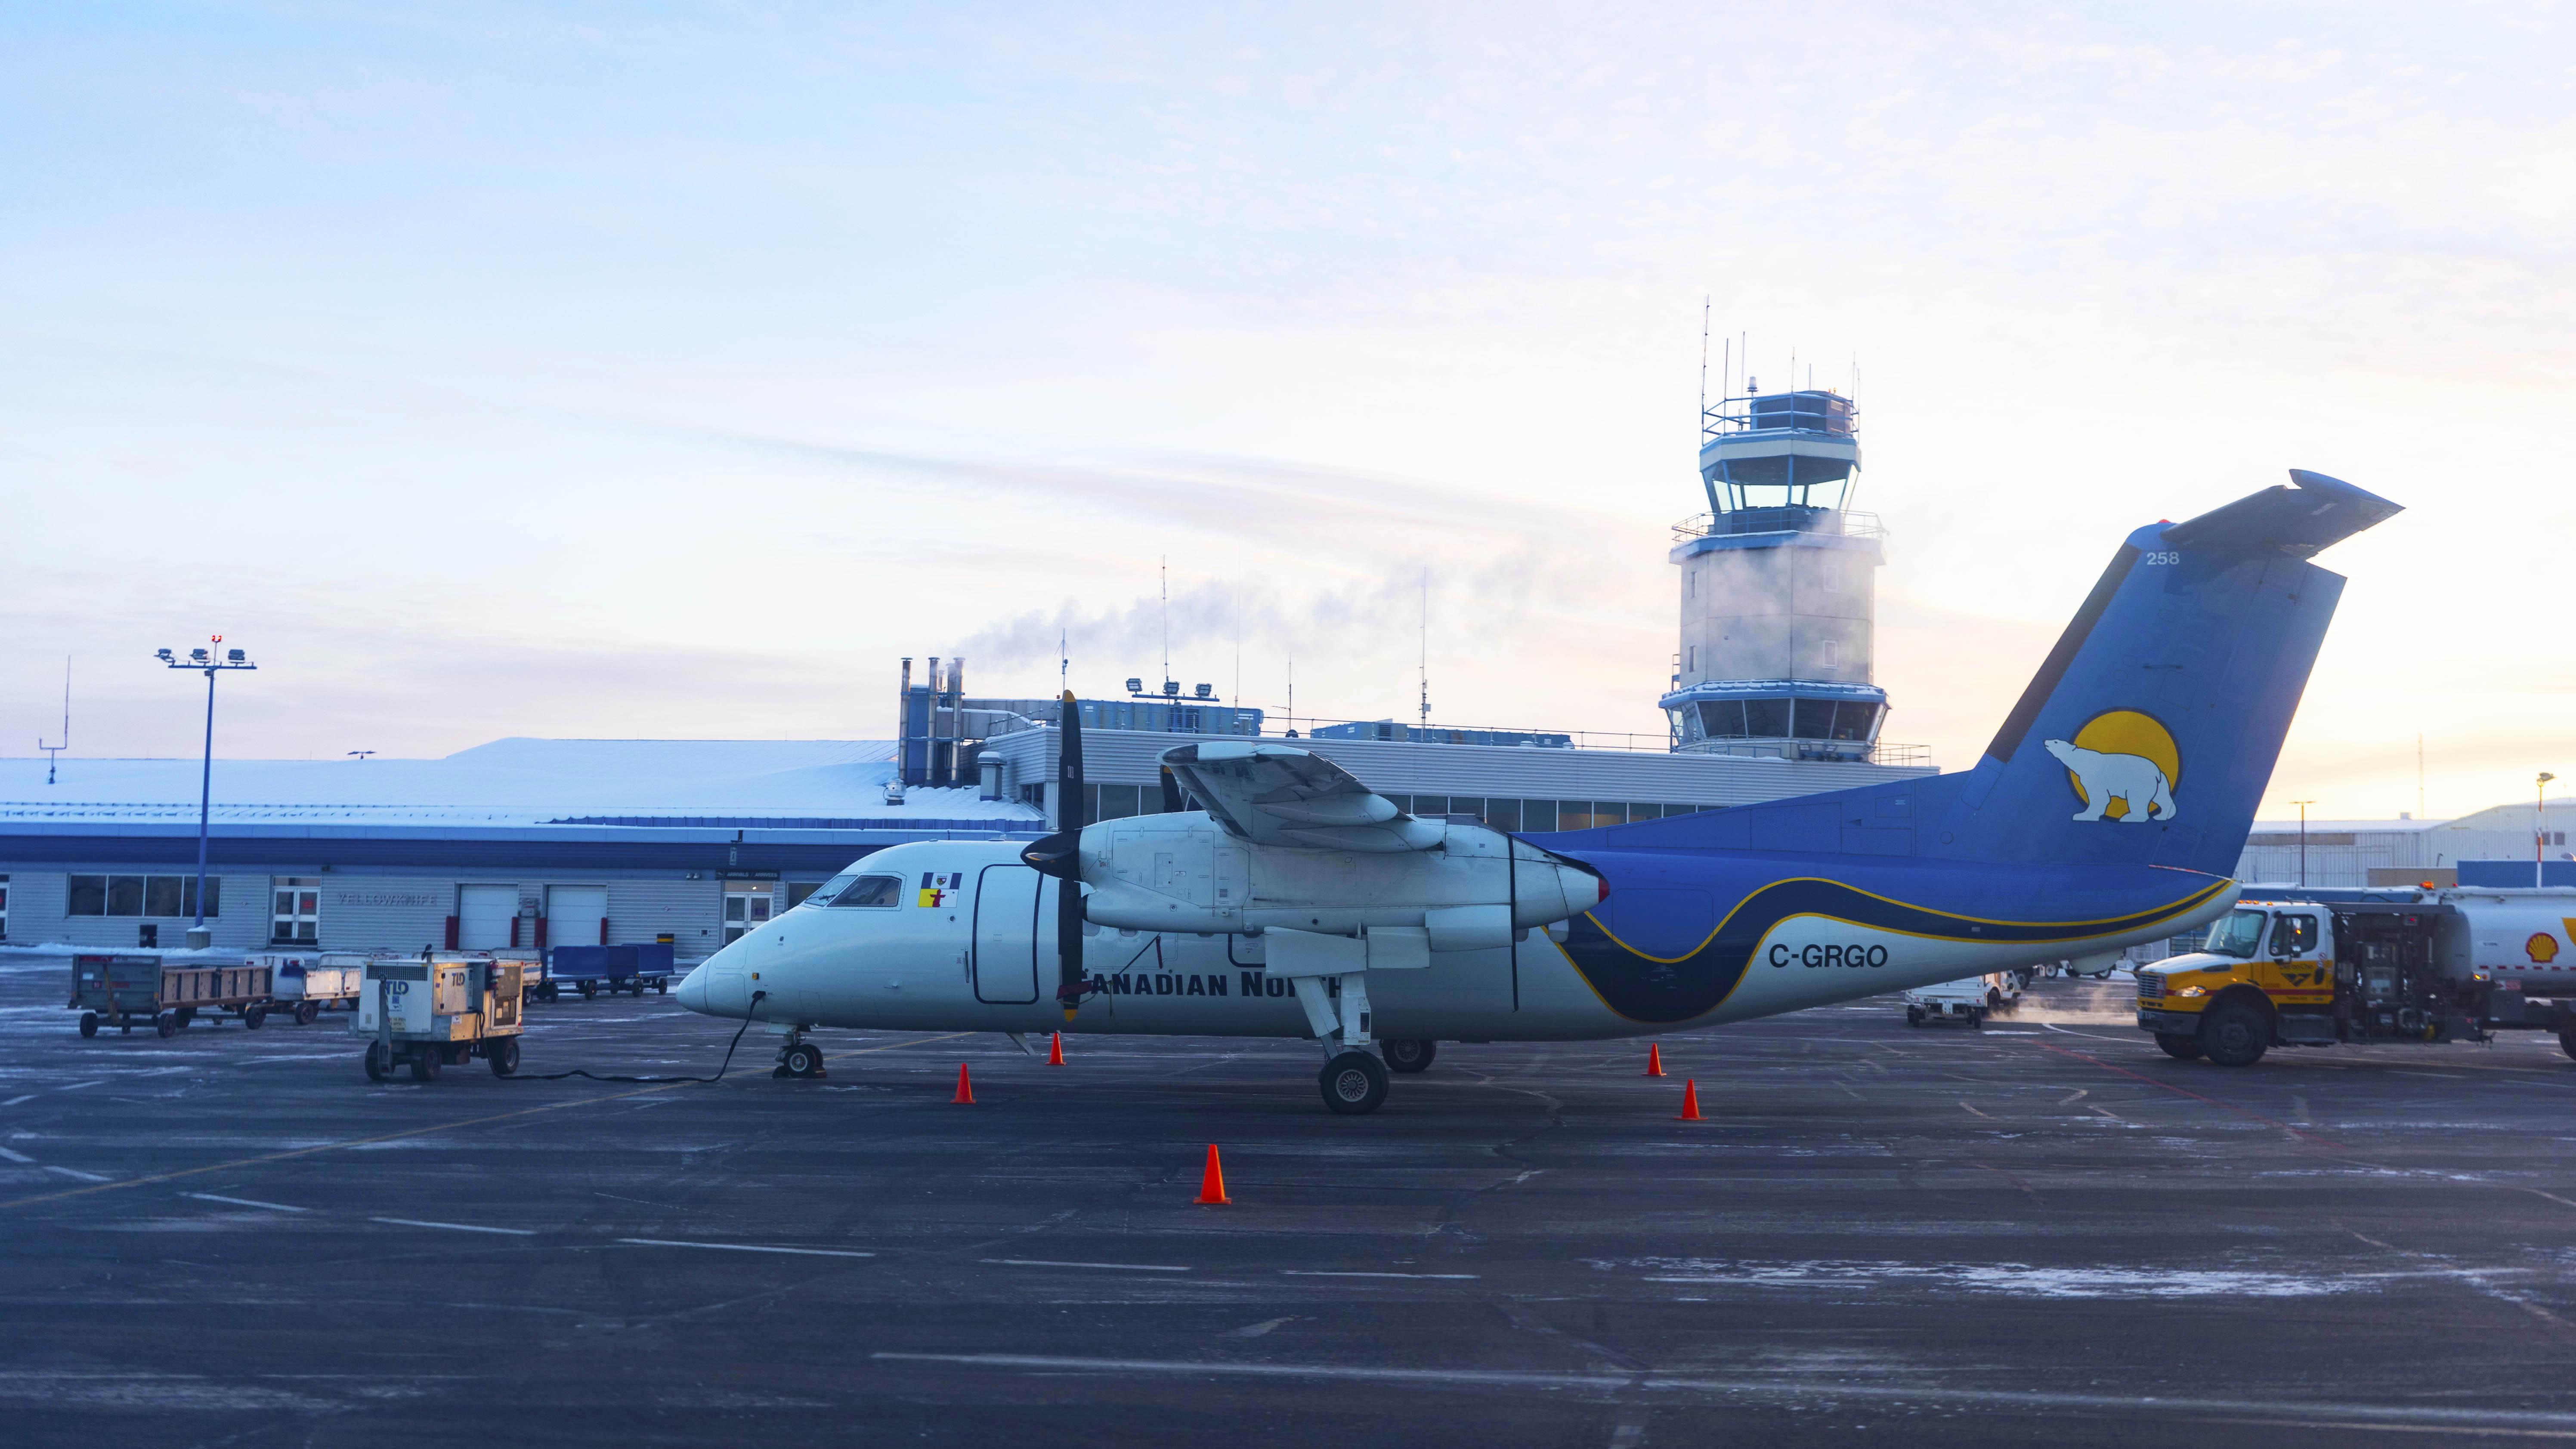 A Canadian North aircraft at Yellowknife Airport in November 2018